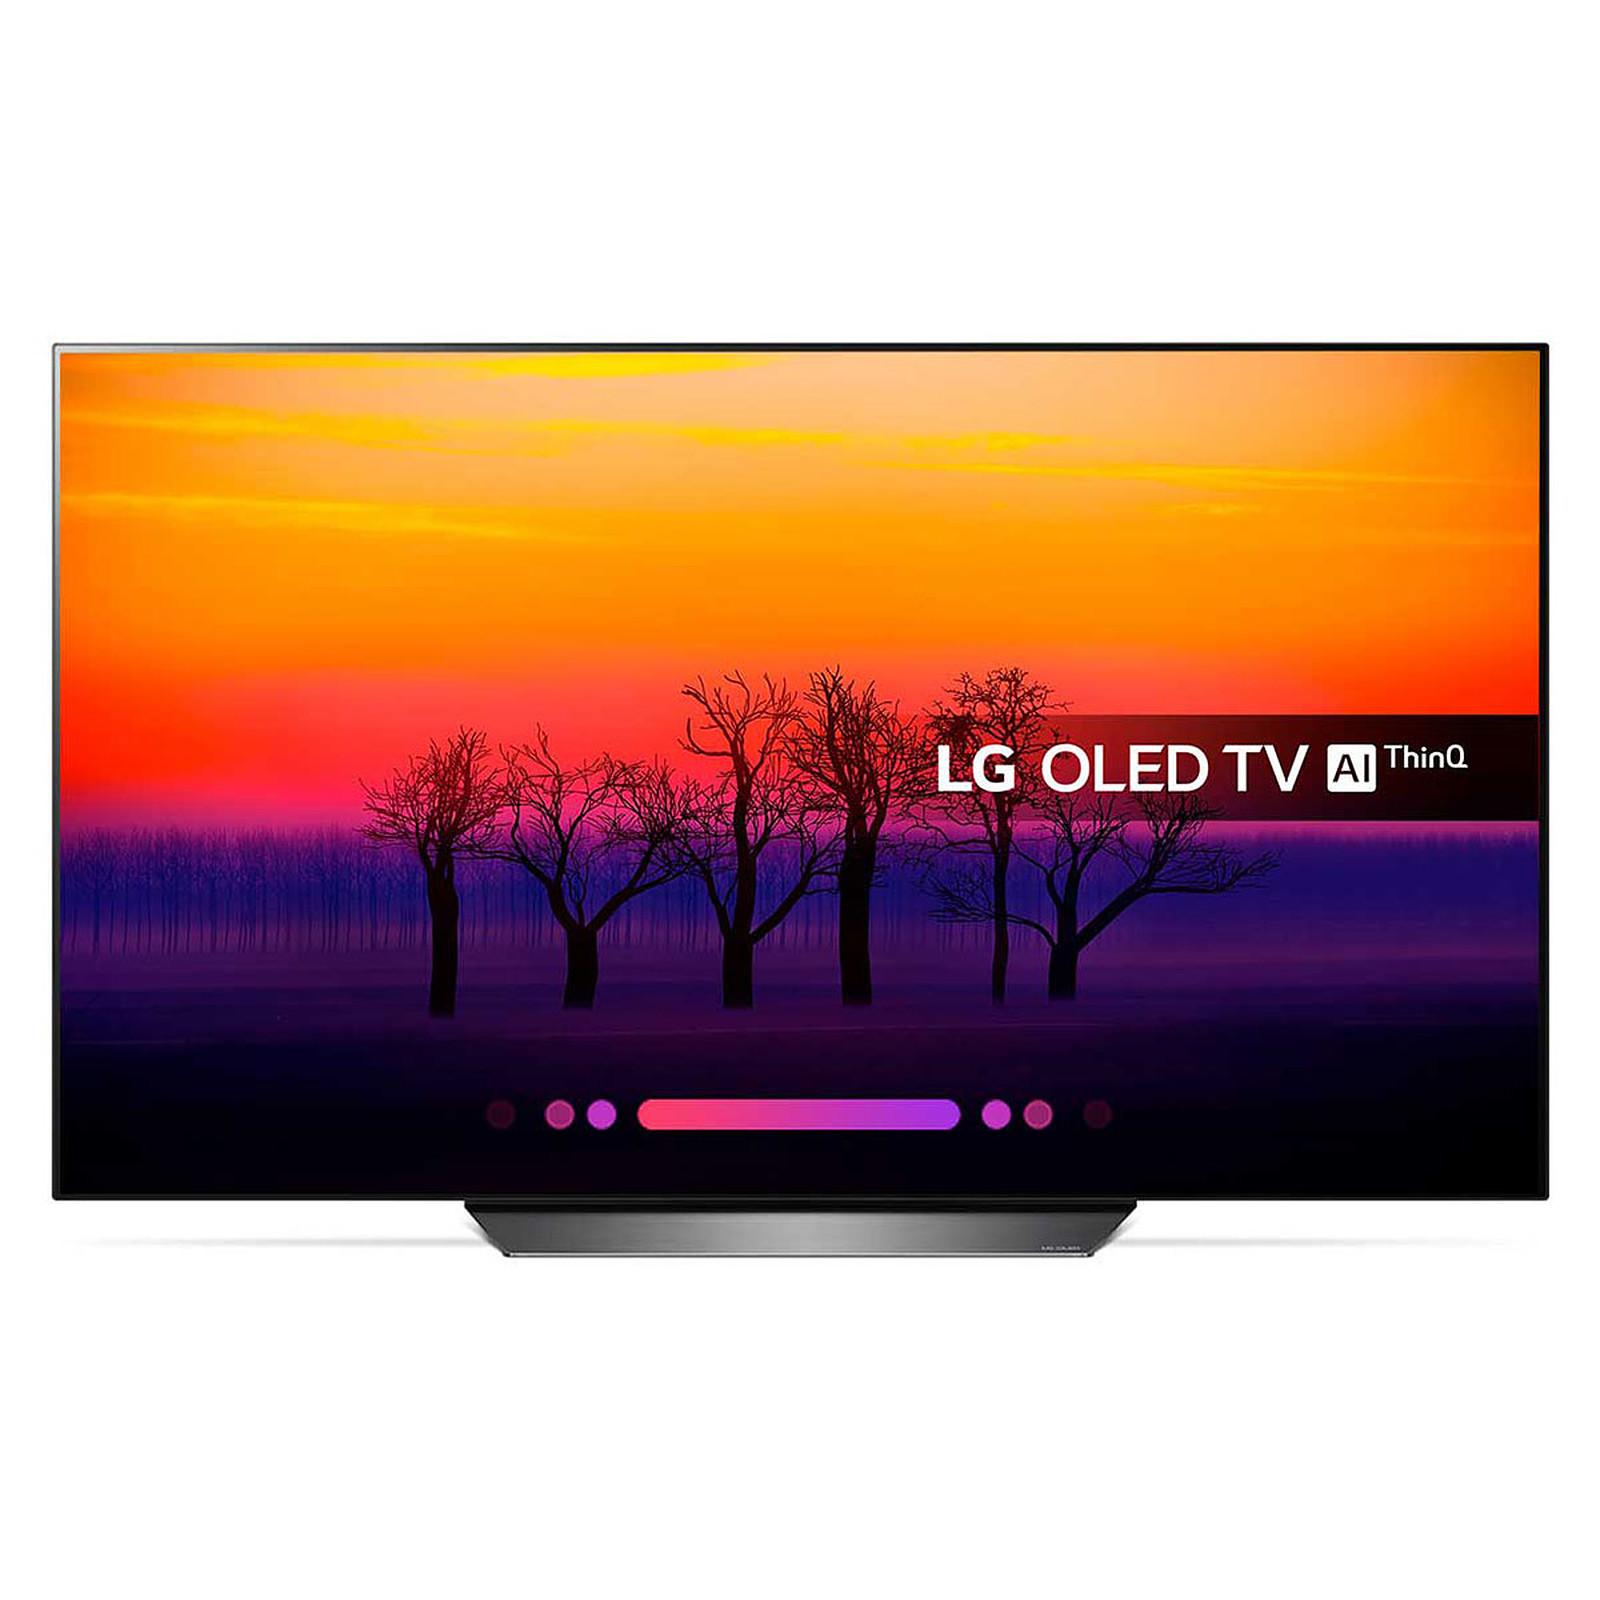 "LG OLED55B8PLA 55"" OLED ULTRAHD 4K"